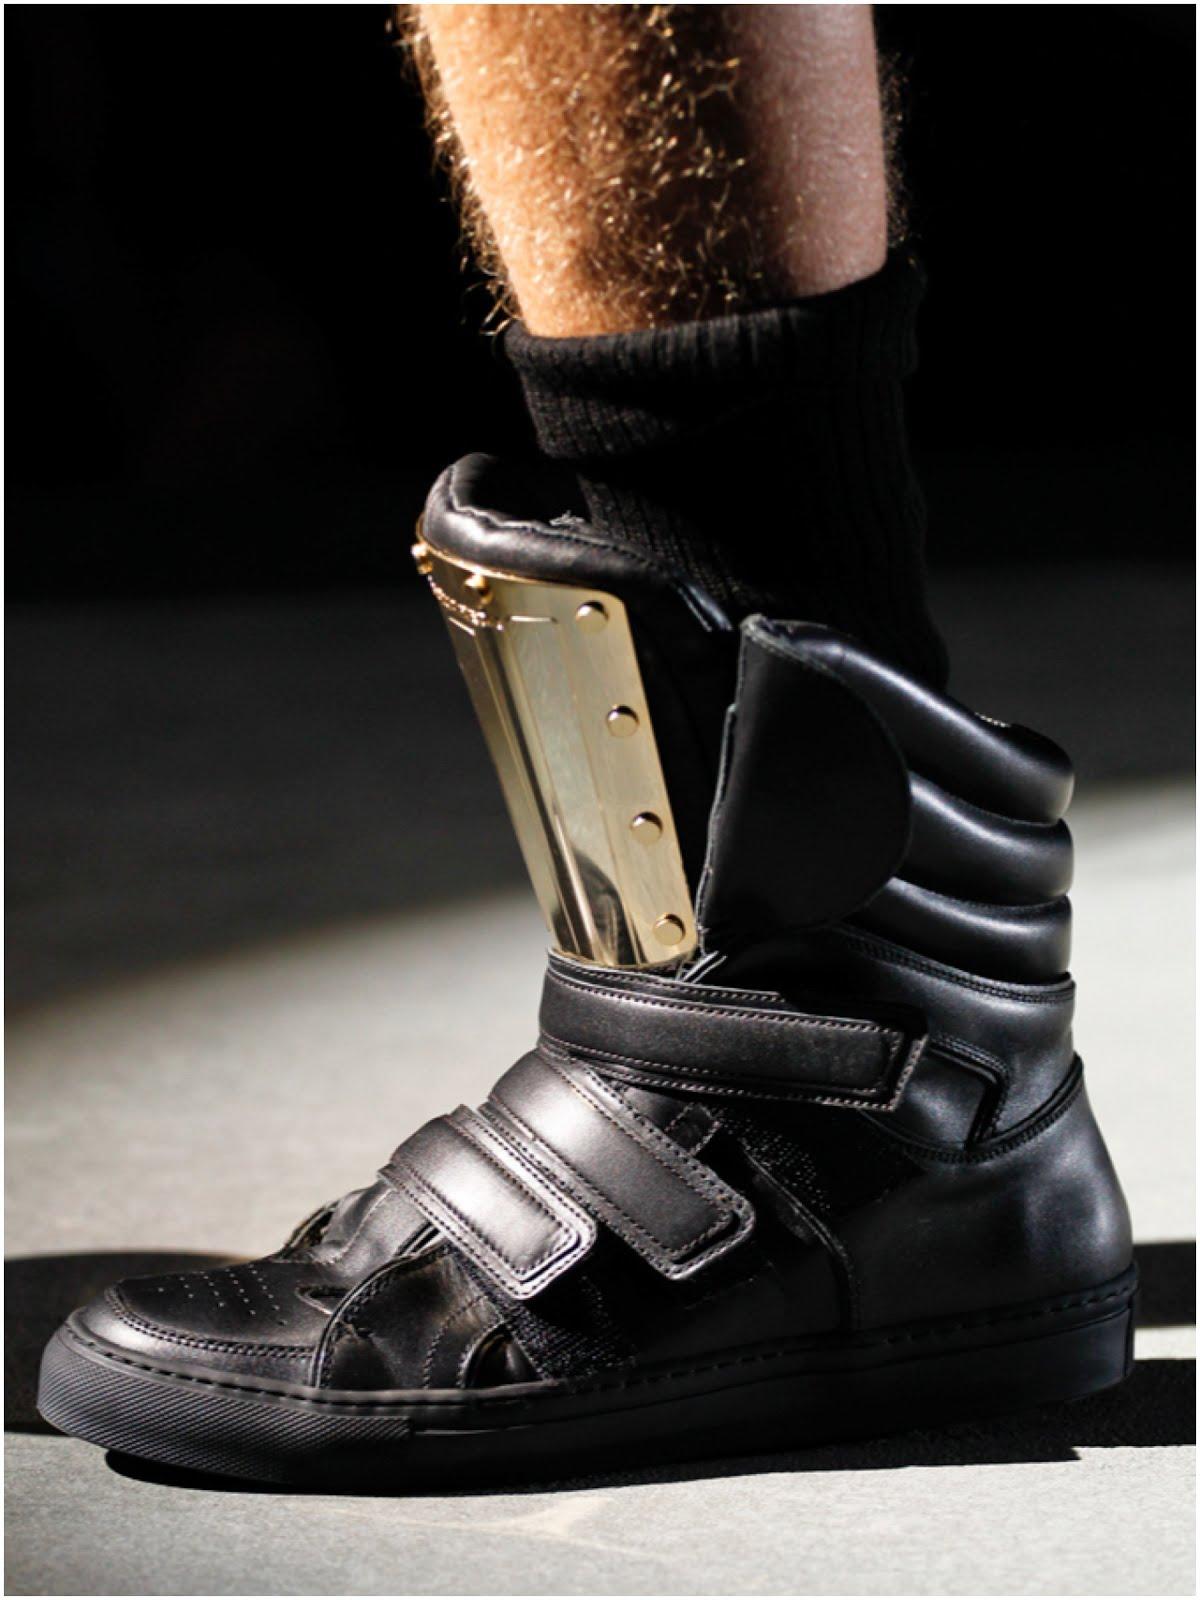 00O00 Menswear Blog: Jason Derulo's DSquared2 mirrored leather metal insert sneakers - 2013 Radio Disney Music Awards April 2013